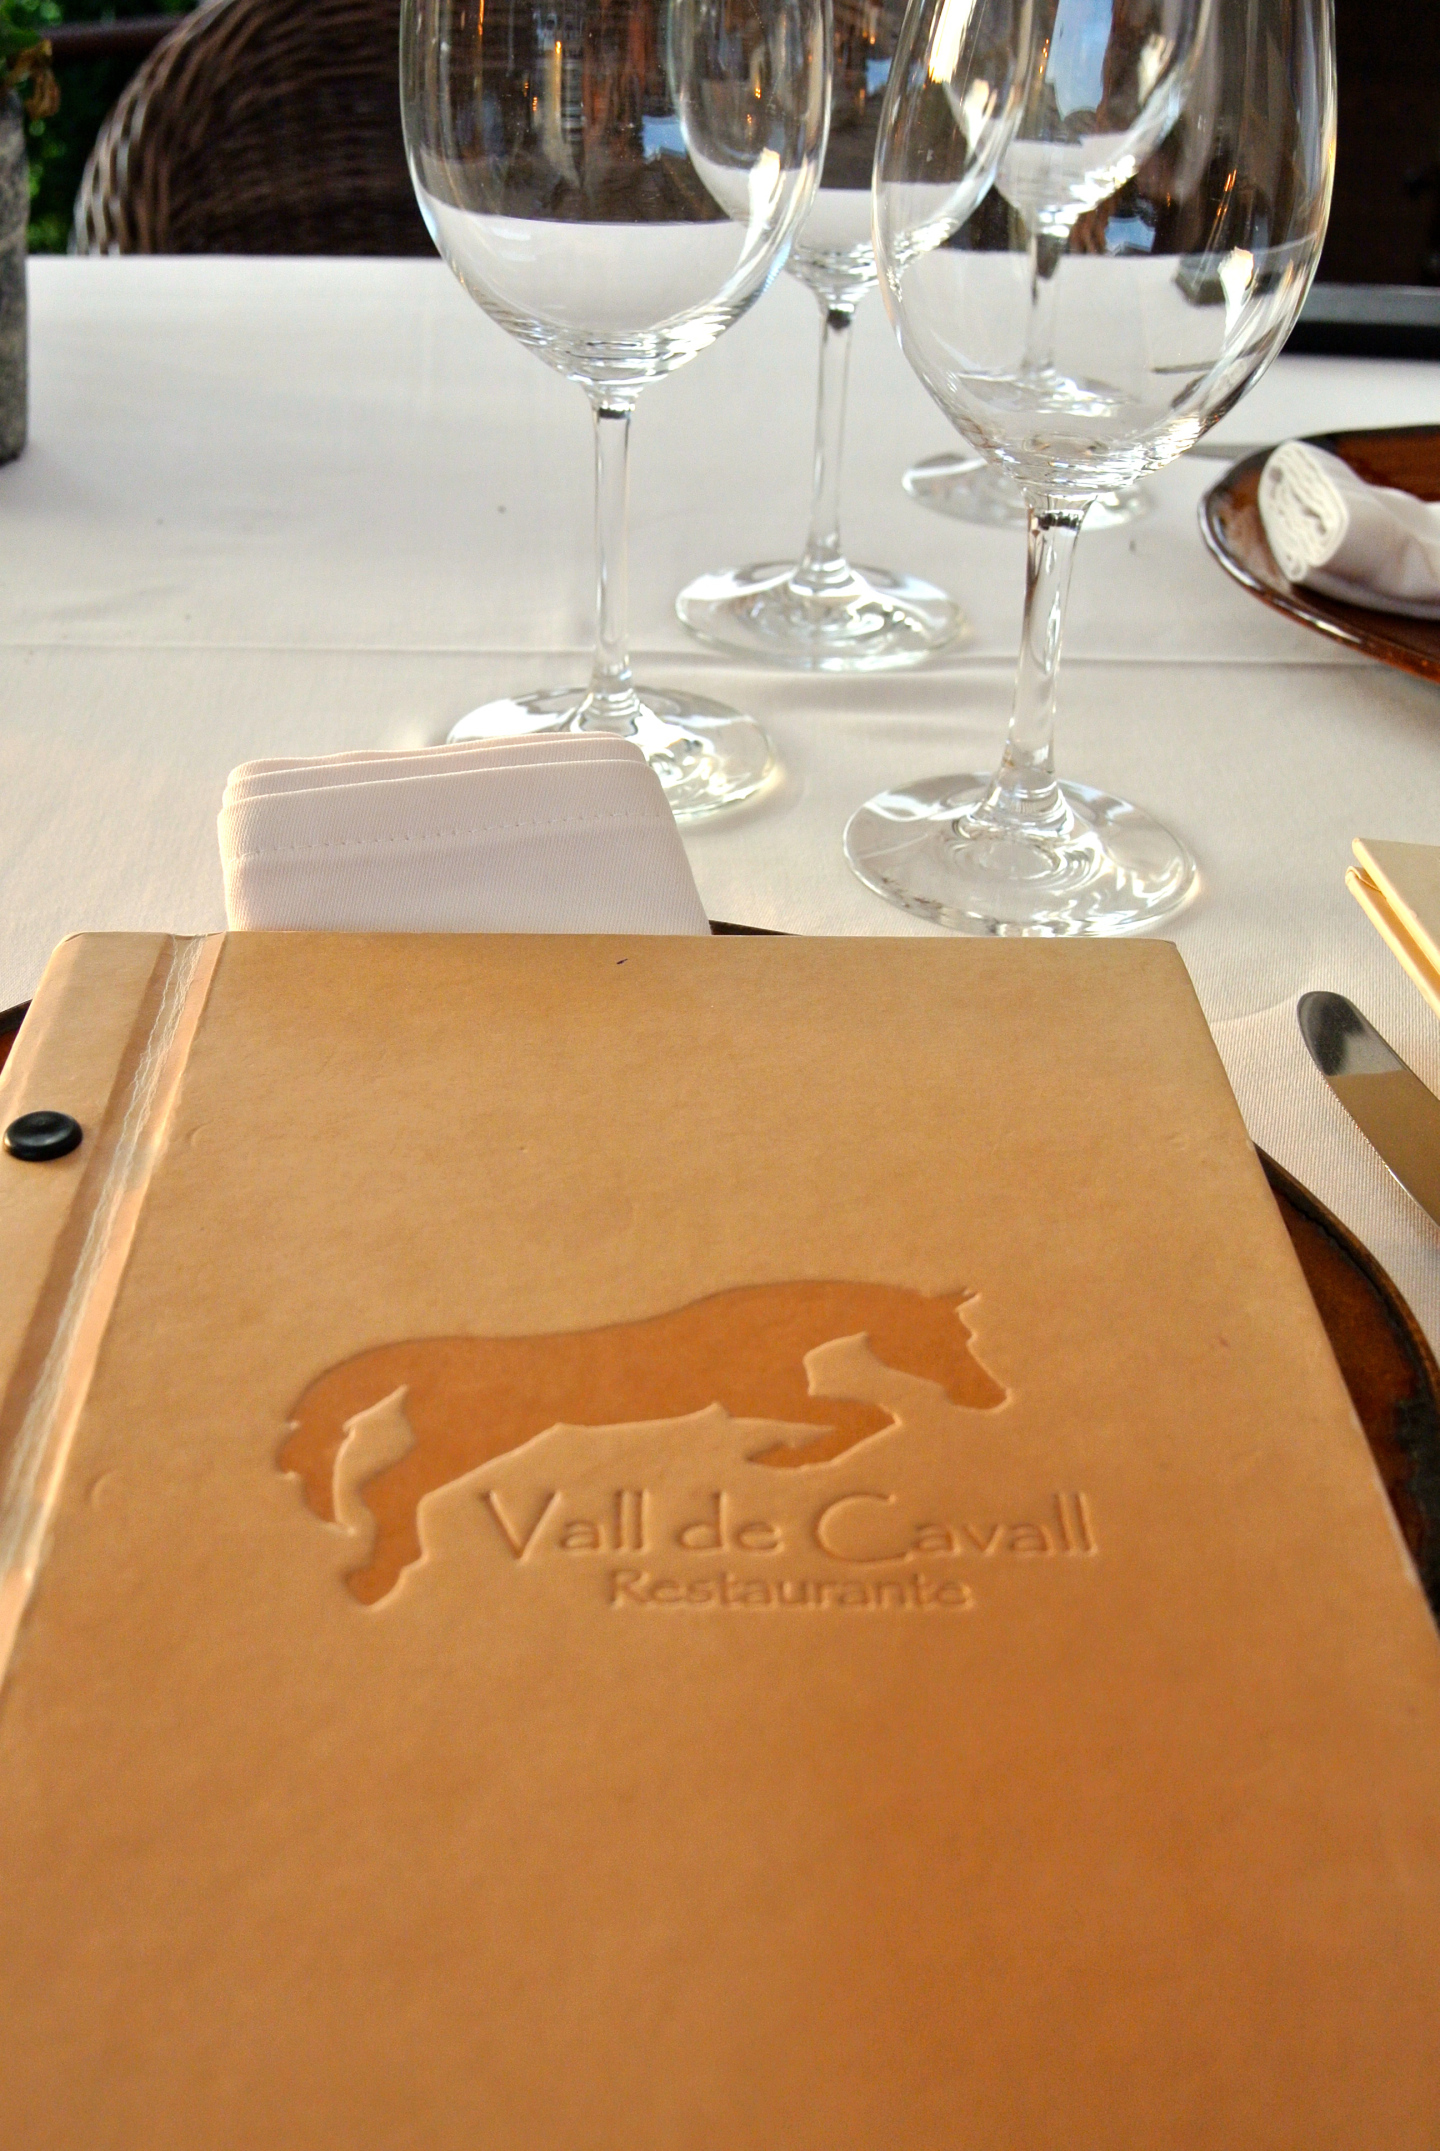 Val de Cavall Menu Restaurante.jpg